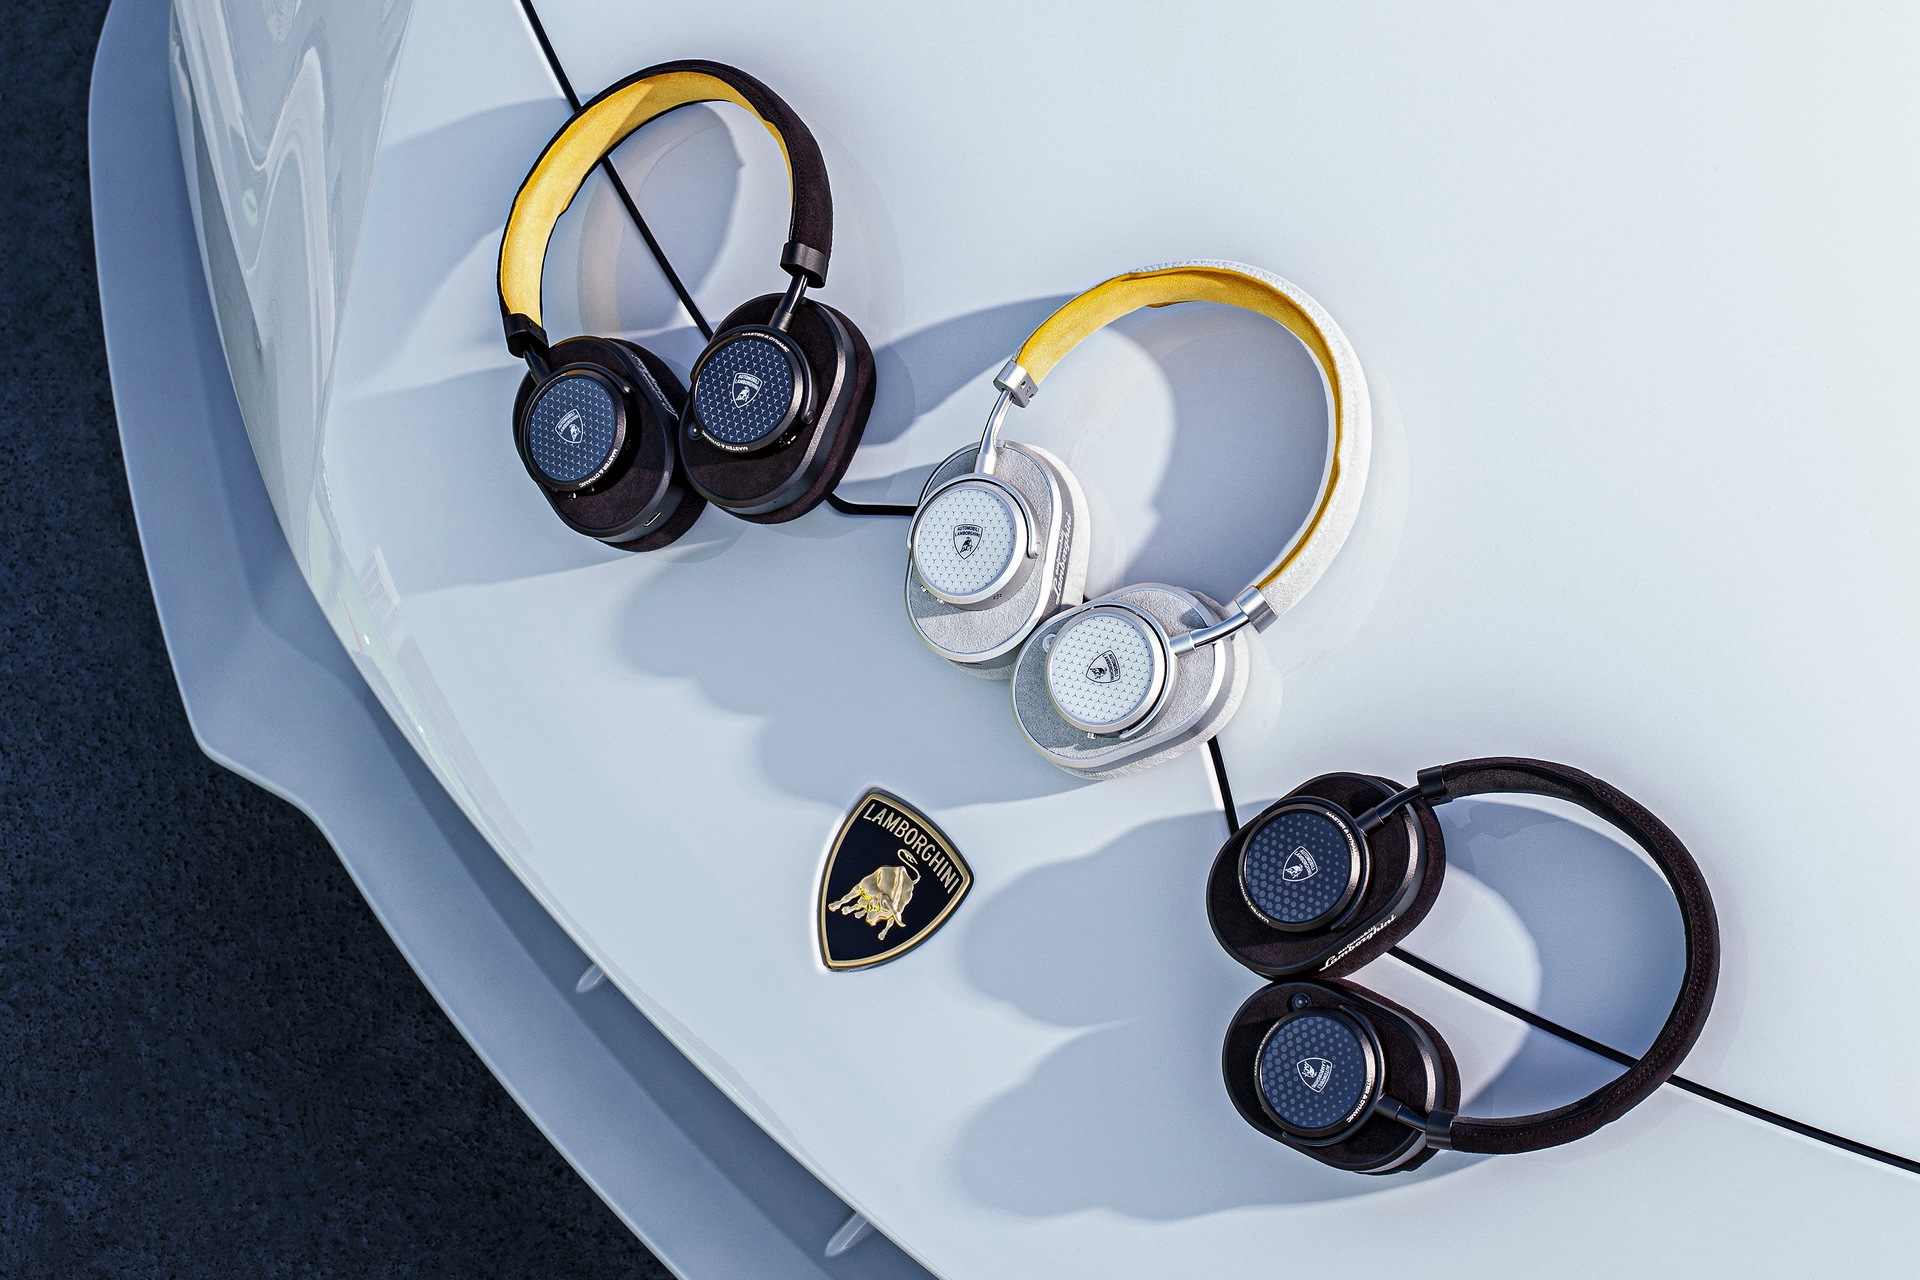 lamborghini-master-dynamic-wireless-headphones-earphones-7